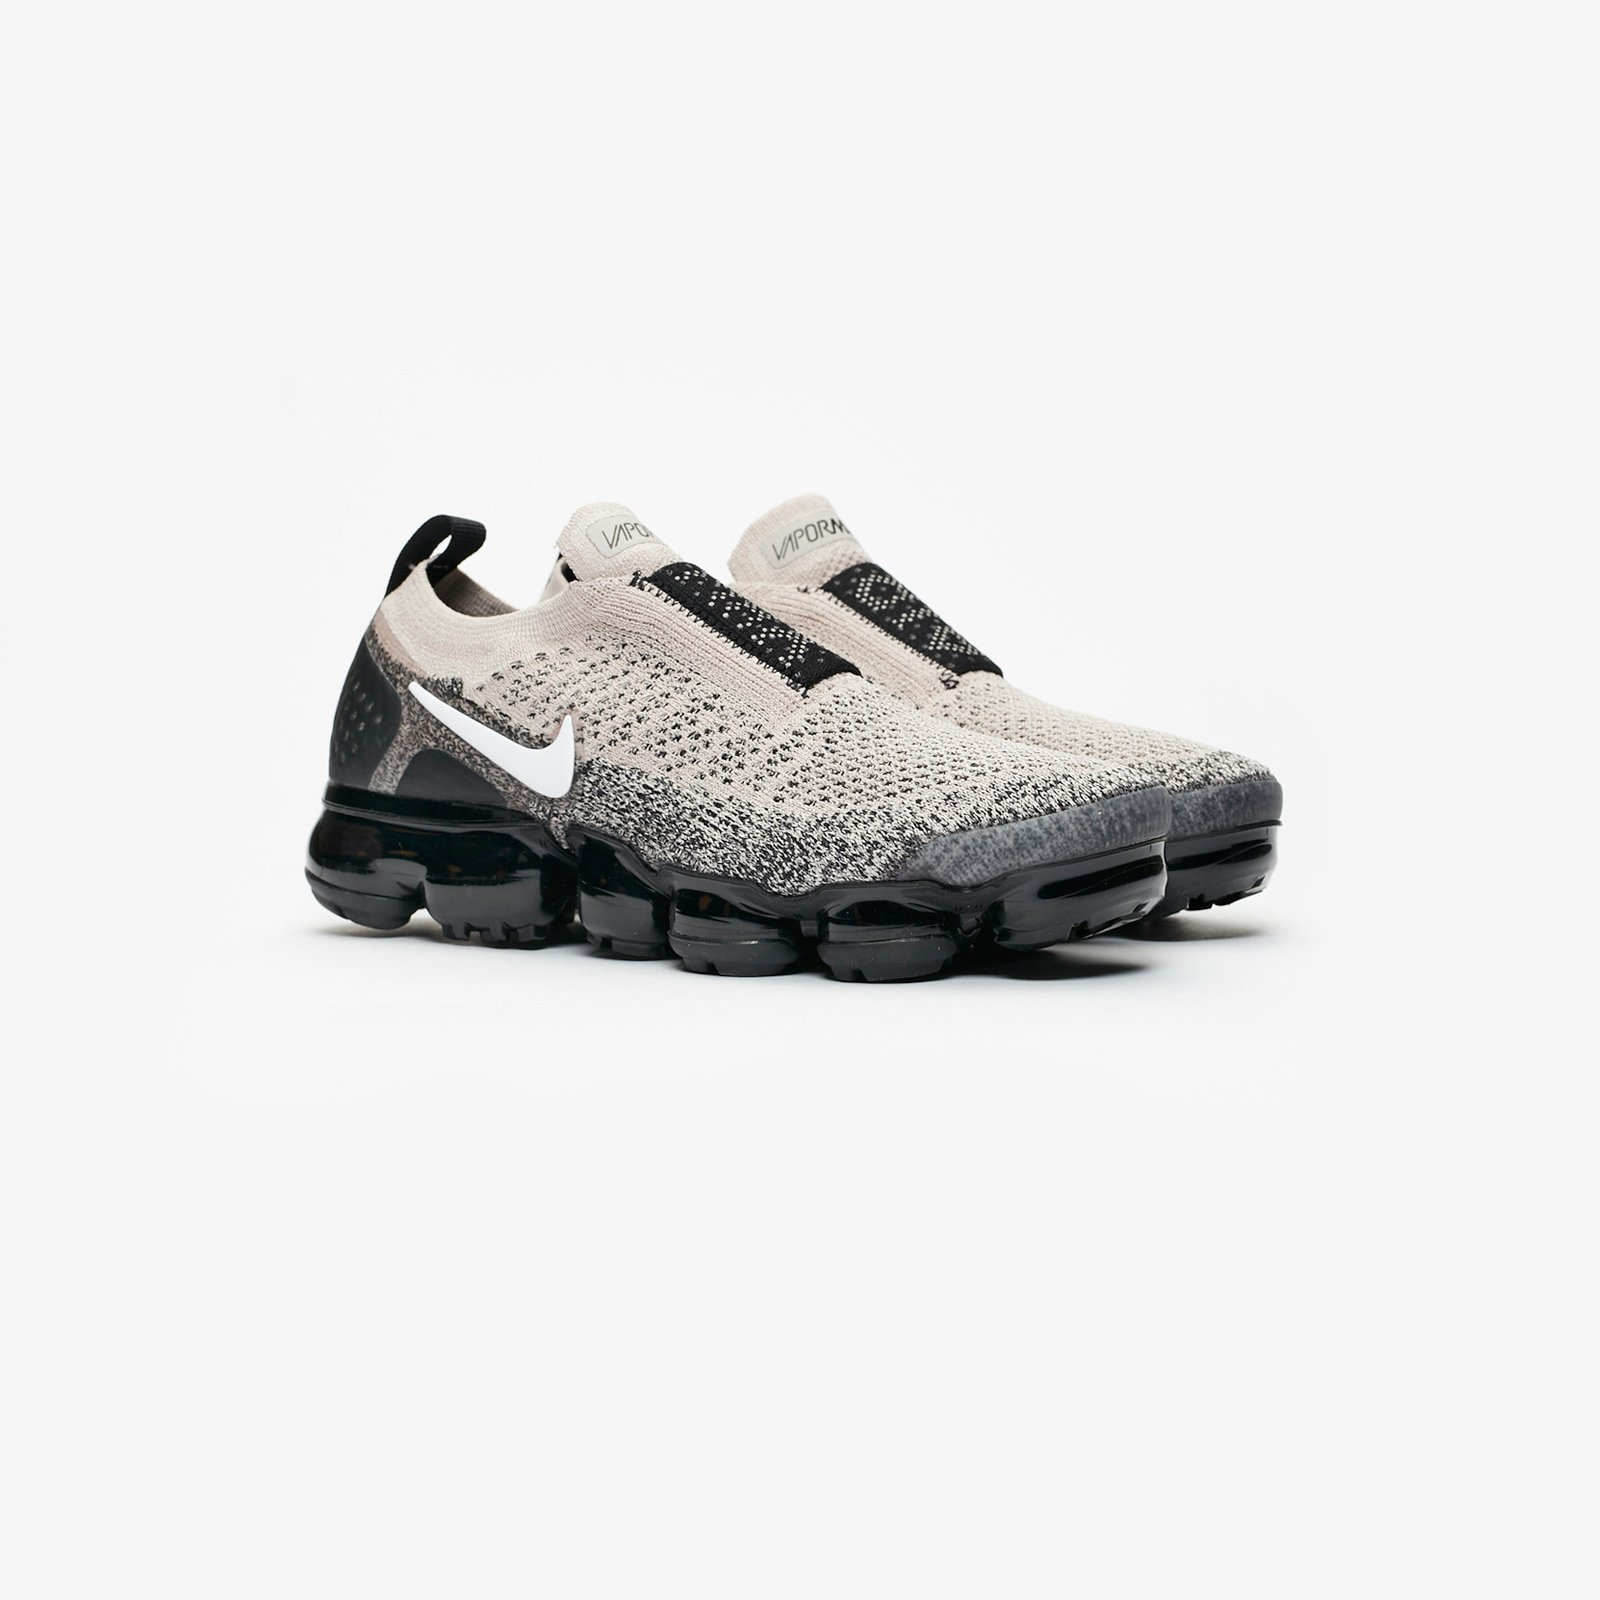 Nike Wmns Air Vapormax FK Moc 2 - Aj6599-202 - Sneakersnstuff ...